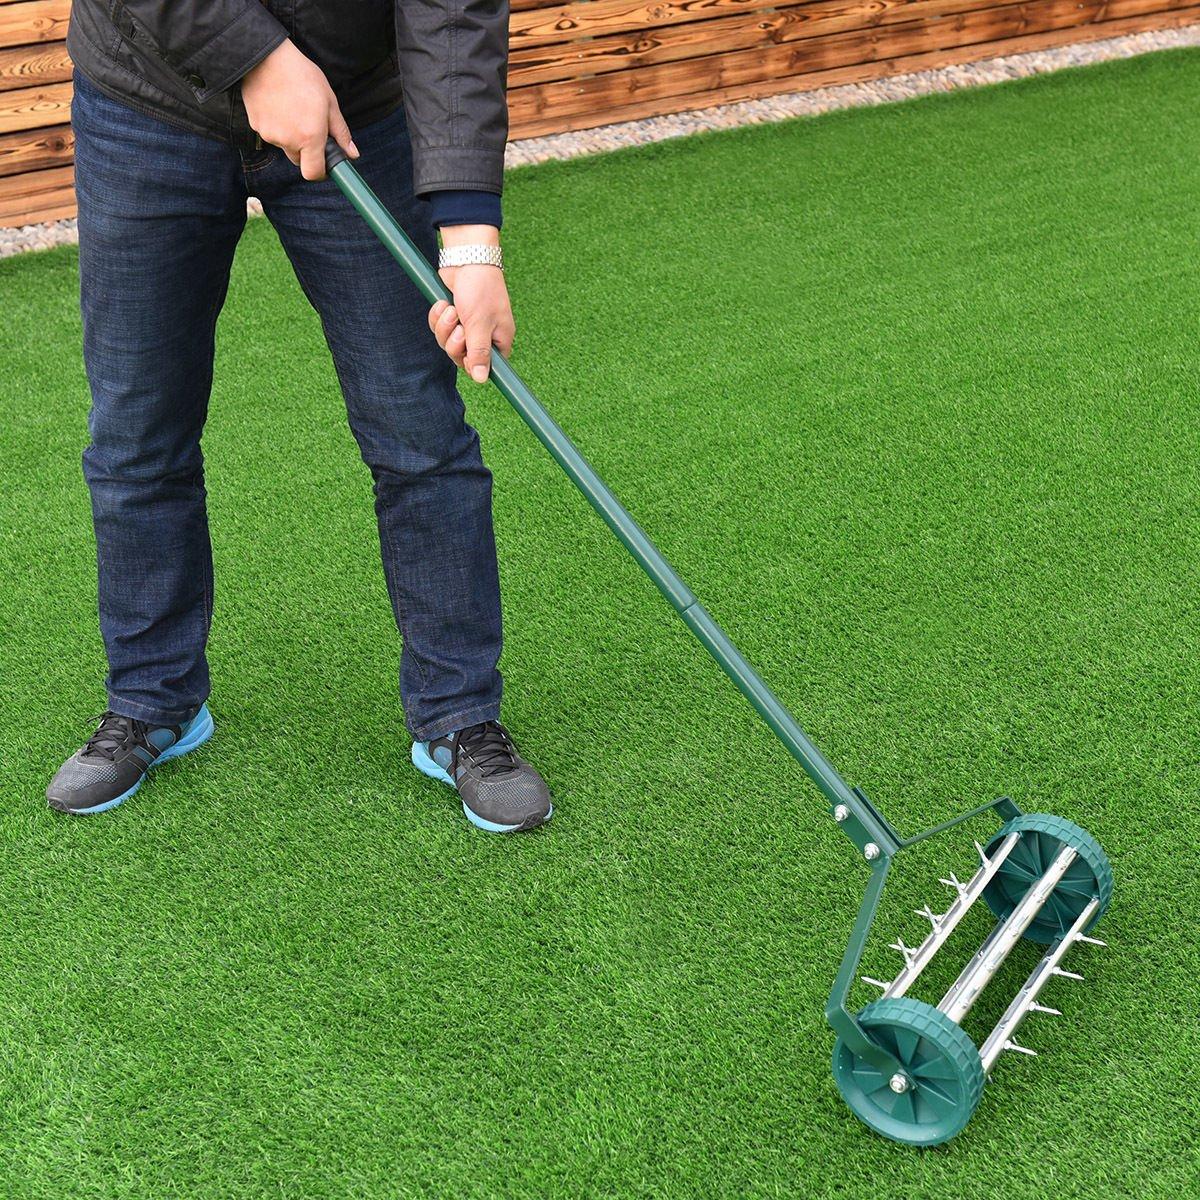 Moon Daughter Heavy Duty Easy Rolling Garden Lawn Aerator Roller Home Grass Steel Handle Green New